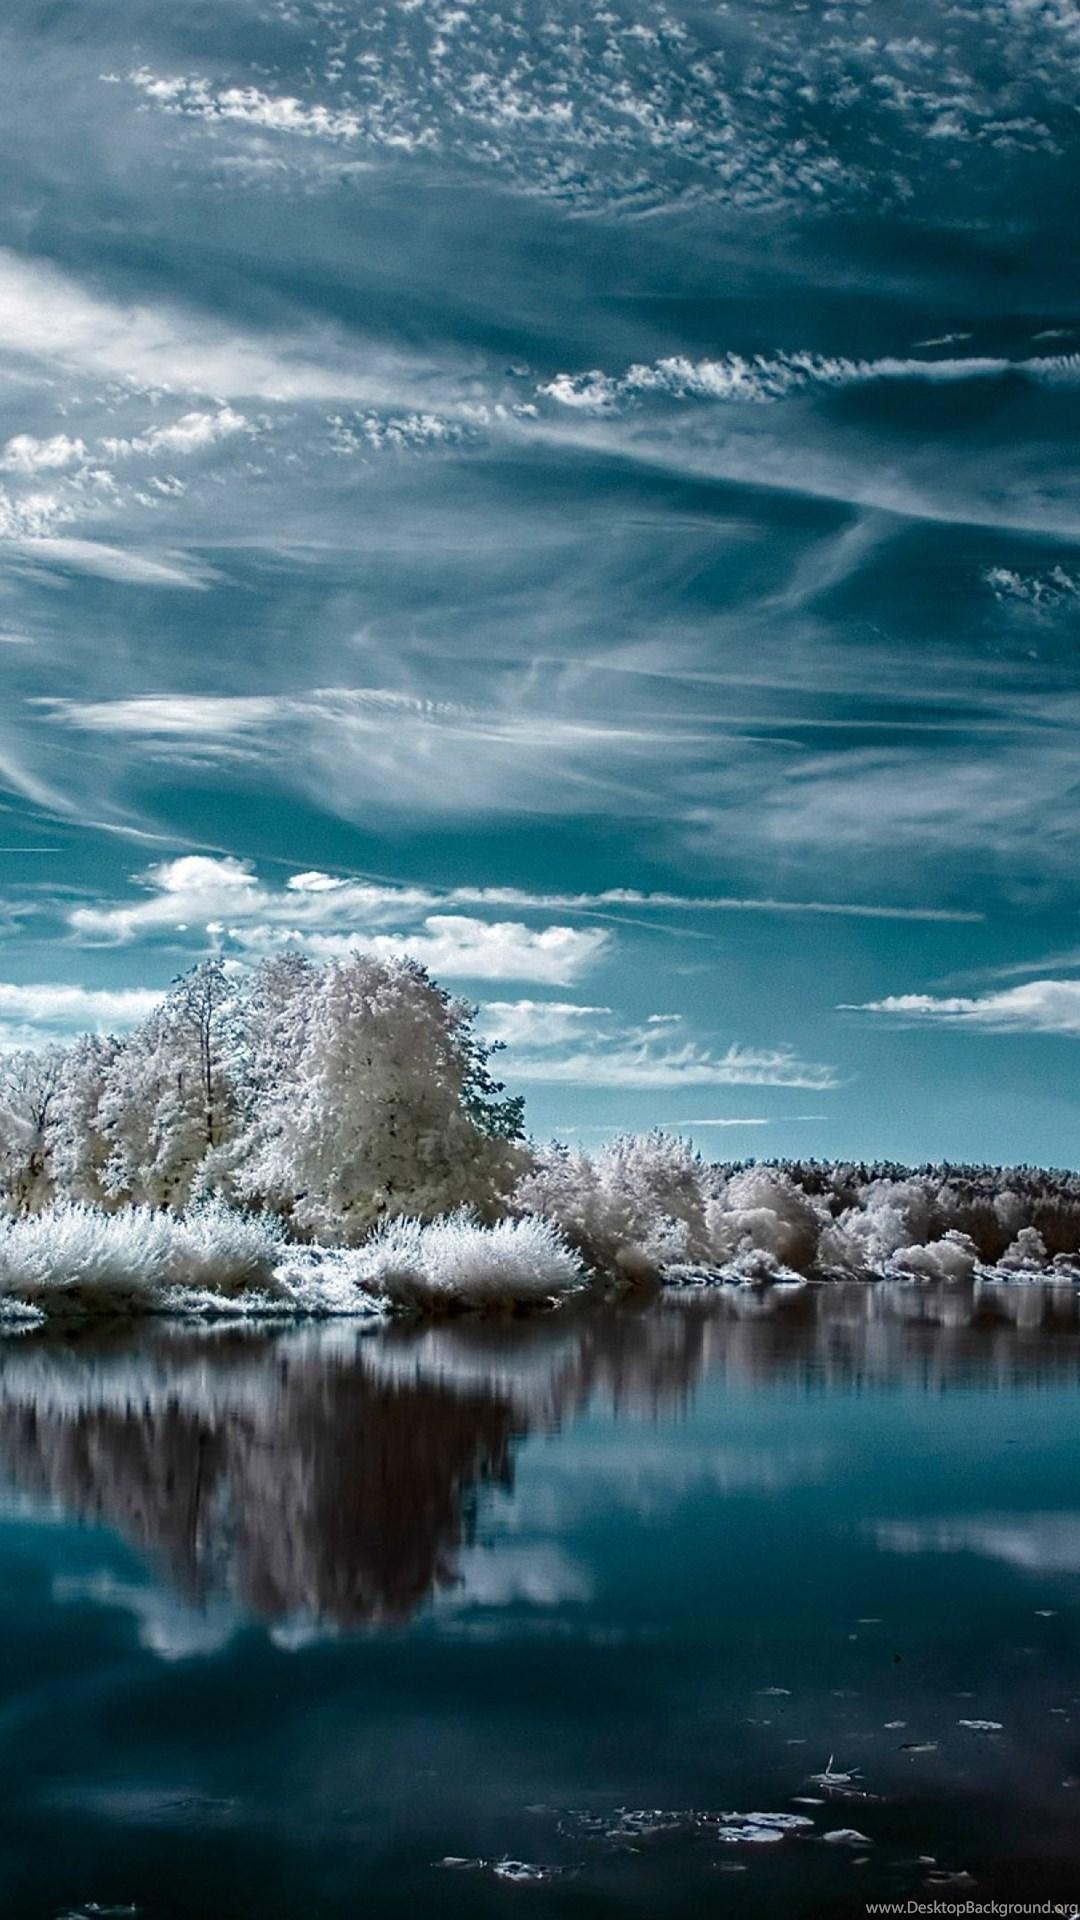 Download Wallpapers 3840x2160 Nature Lake Winter Snow 4k Ultra Desktop Background